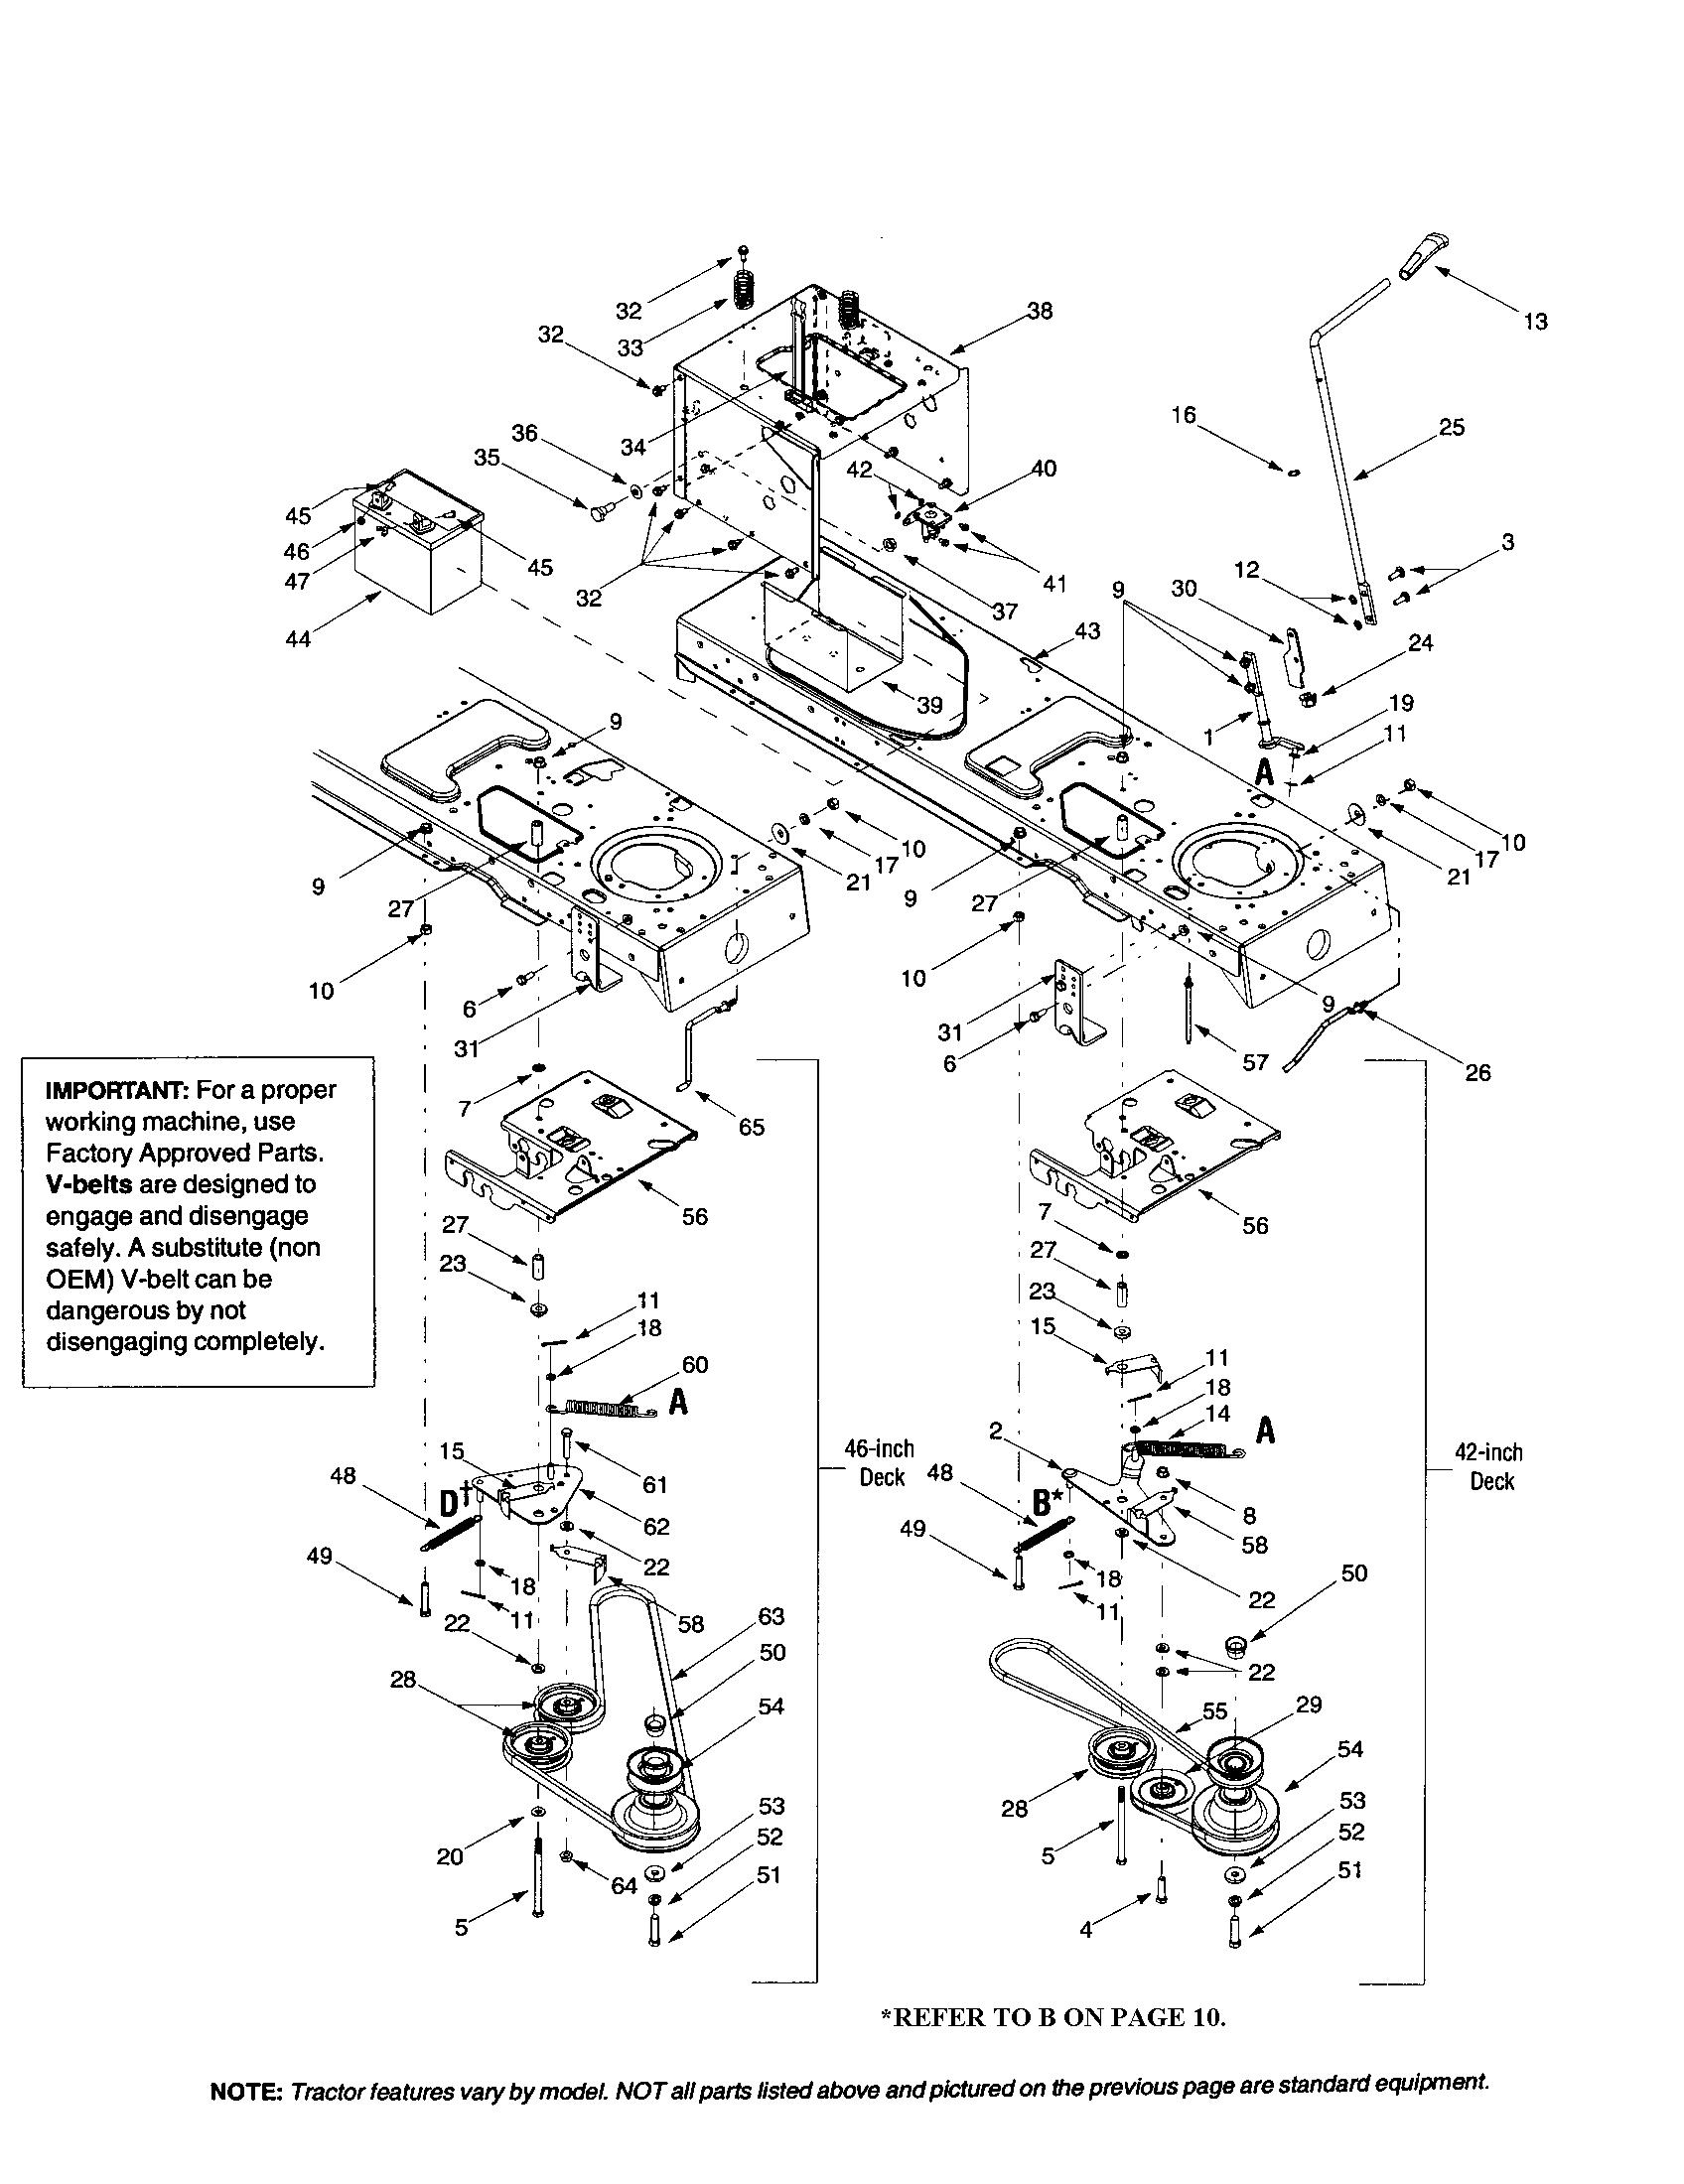 07 troy bilt mustang rzt photos pto wiring diagram